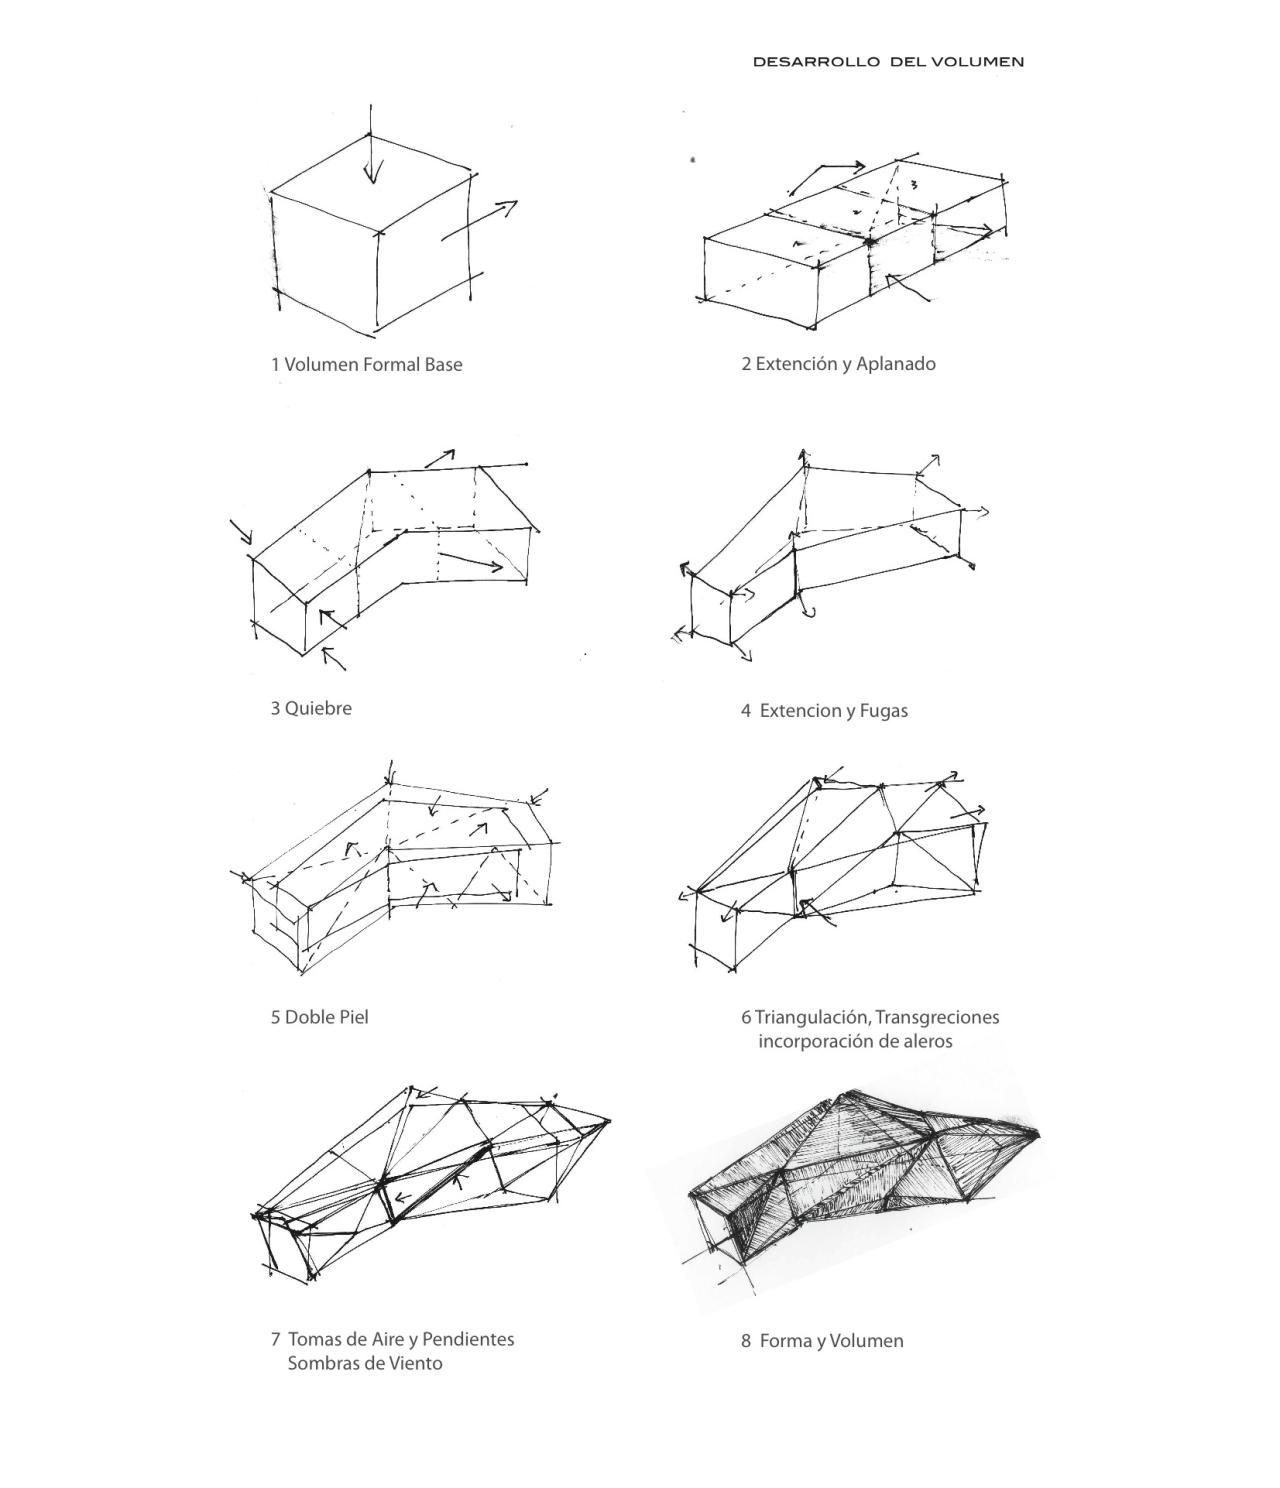 raid 5 concept with diagram ethanol phase